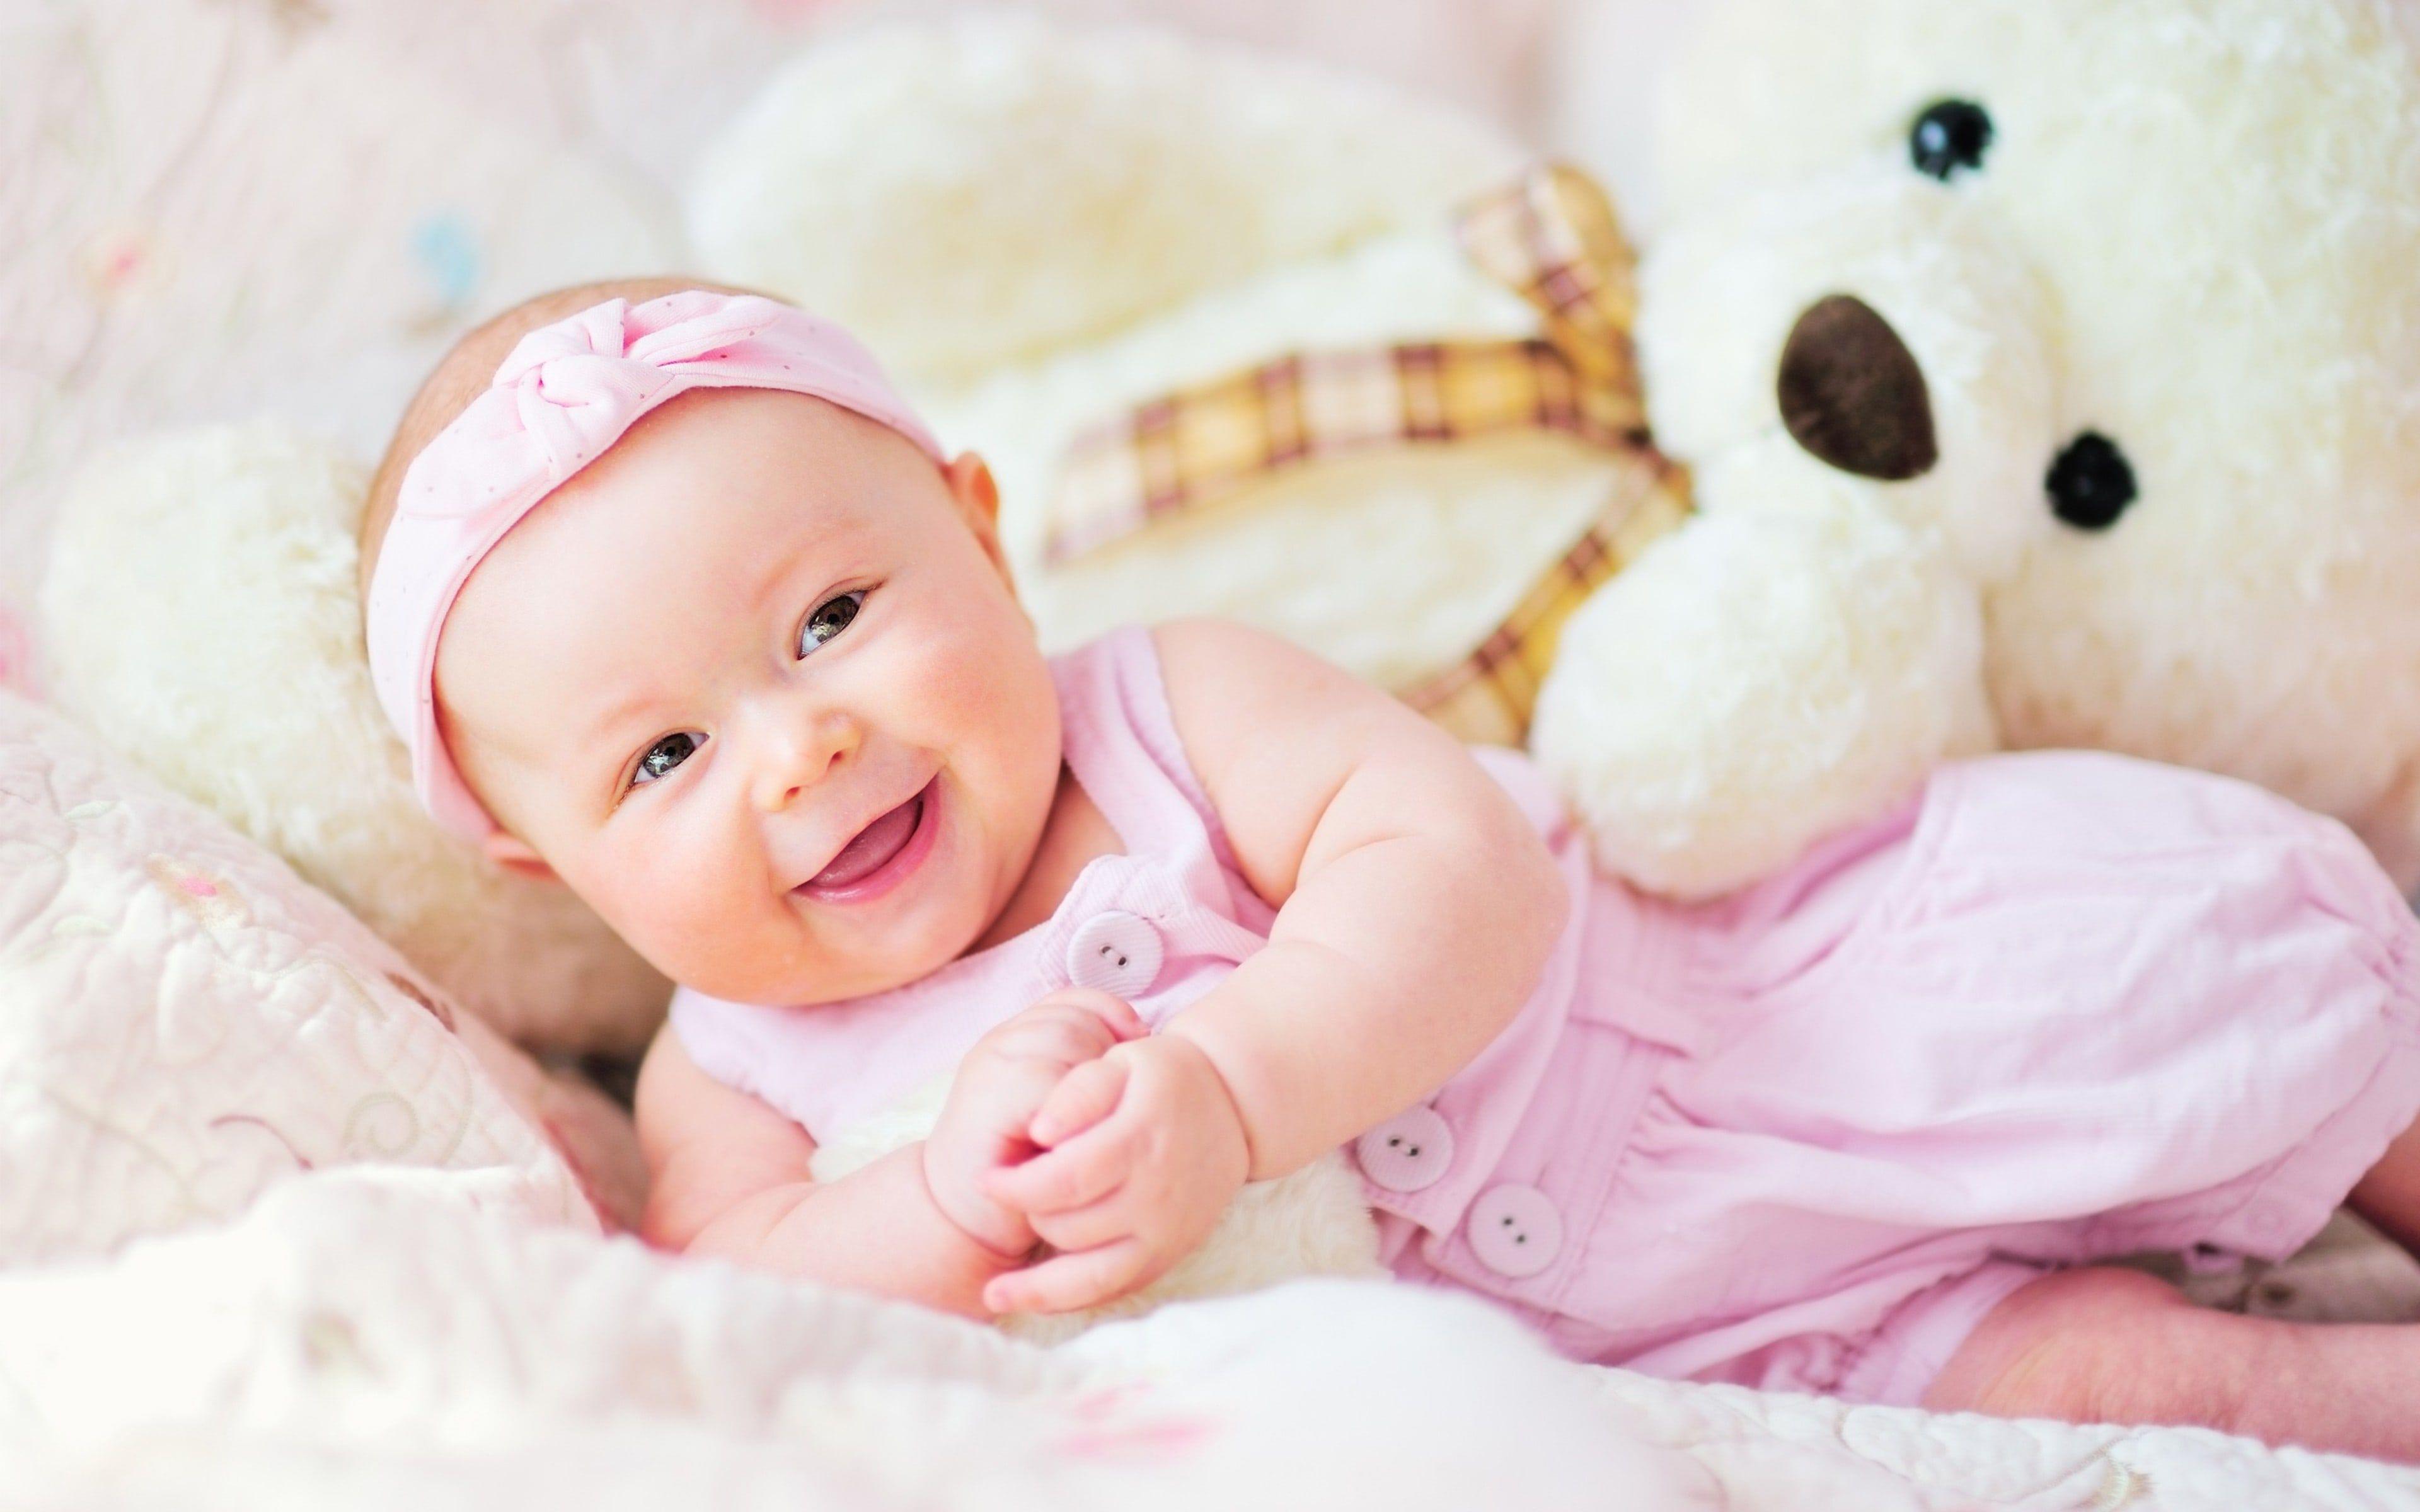 Desktophdwallpaper Org Cute Baby Wallpaper Baby Images Hd Cute Babies